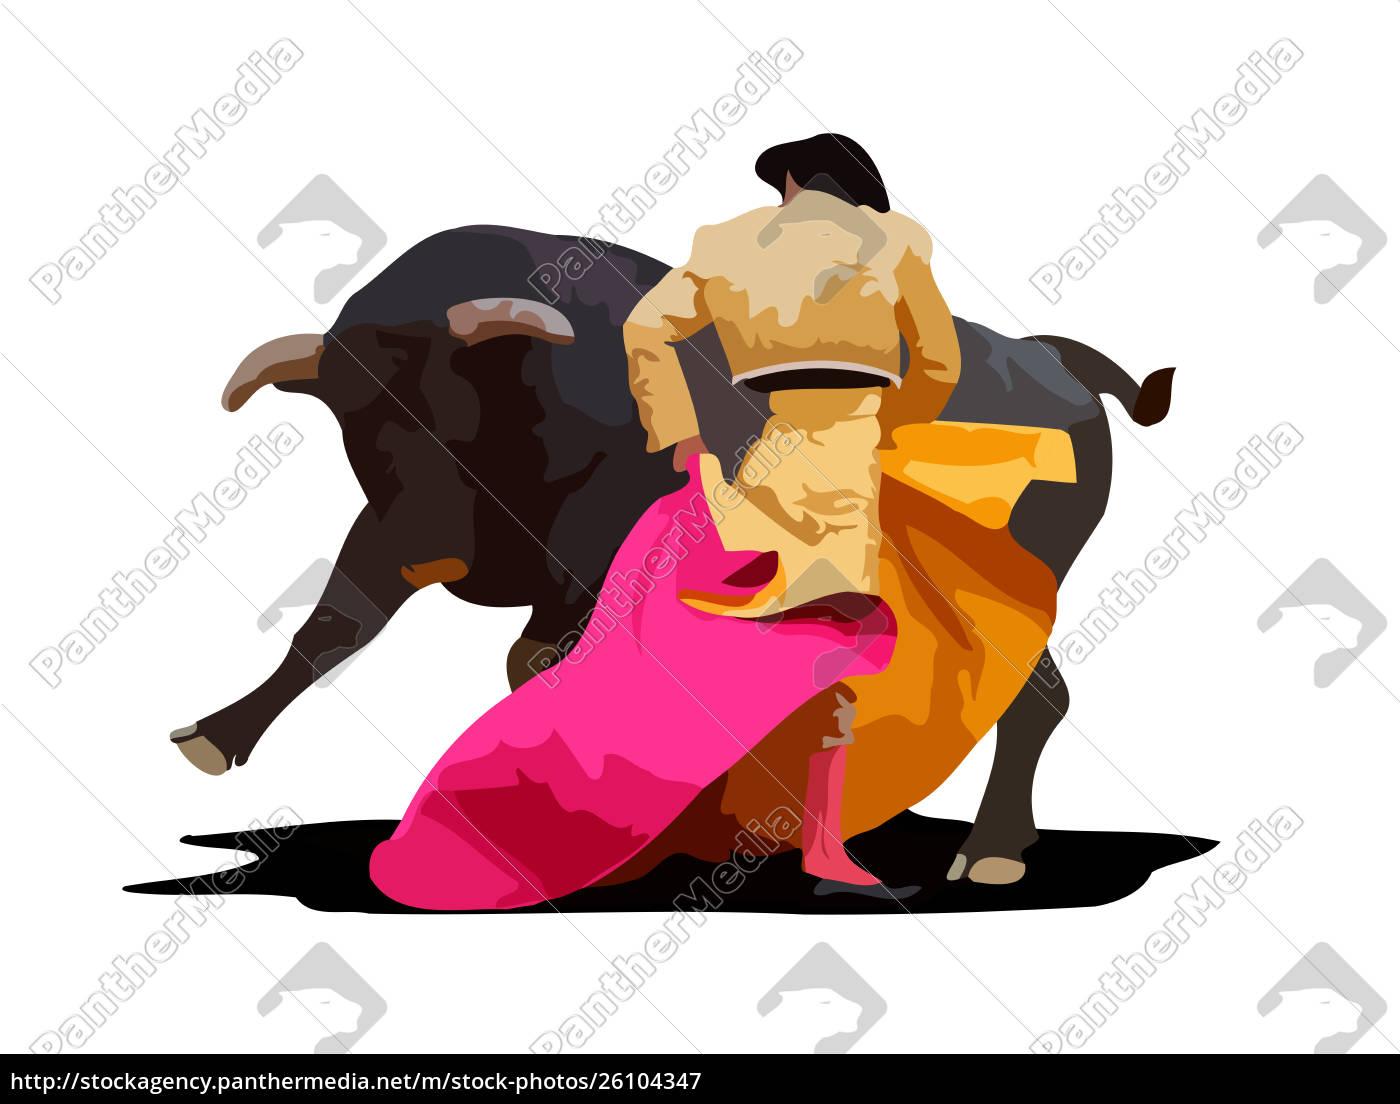 spanische, stierkampfpflege-kultur-kultur, zeigen, illustration - 26104347